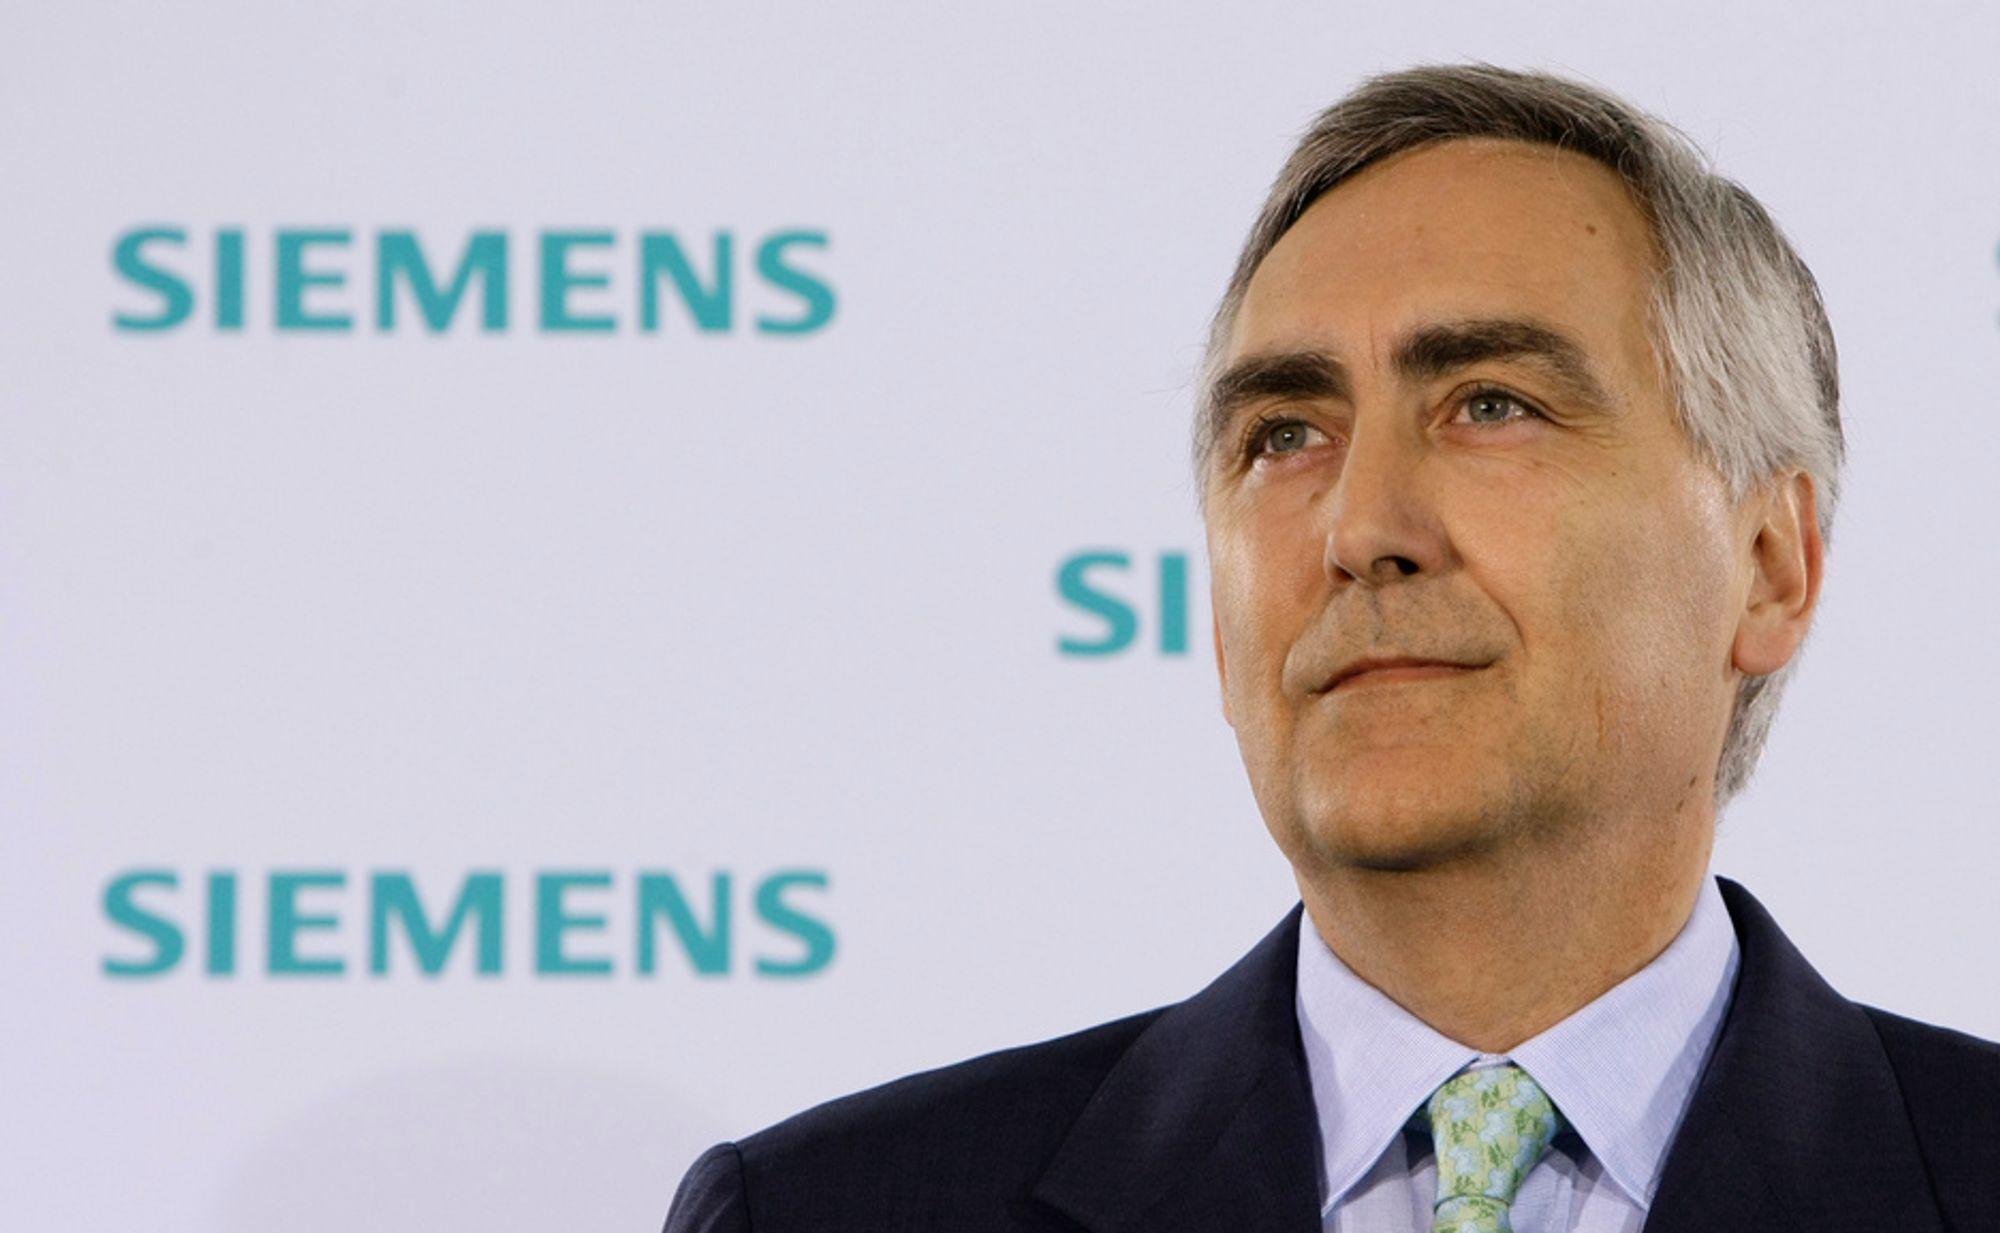 Siemens trapper ned samhandelen med Iran, opplyser konsernsjef Peter Loescher.